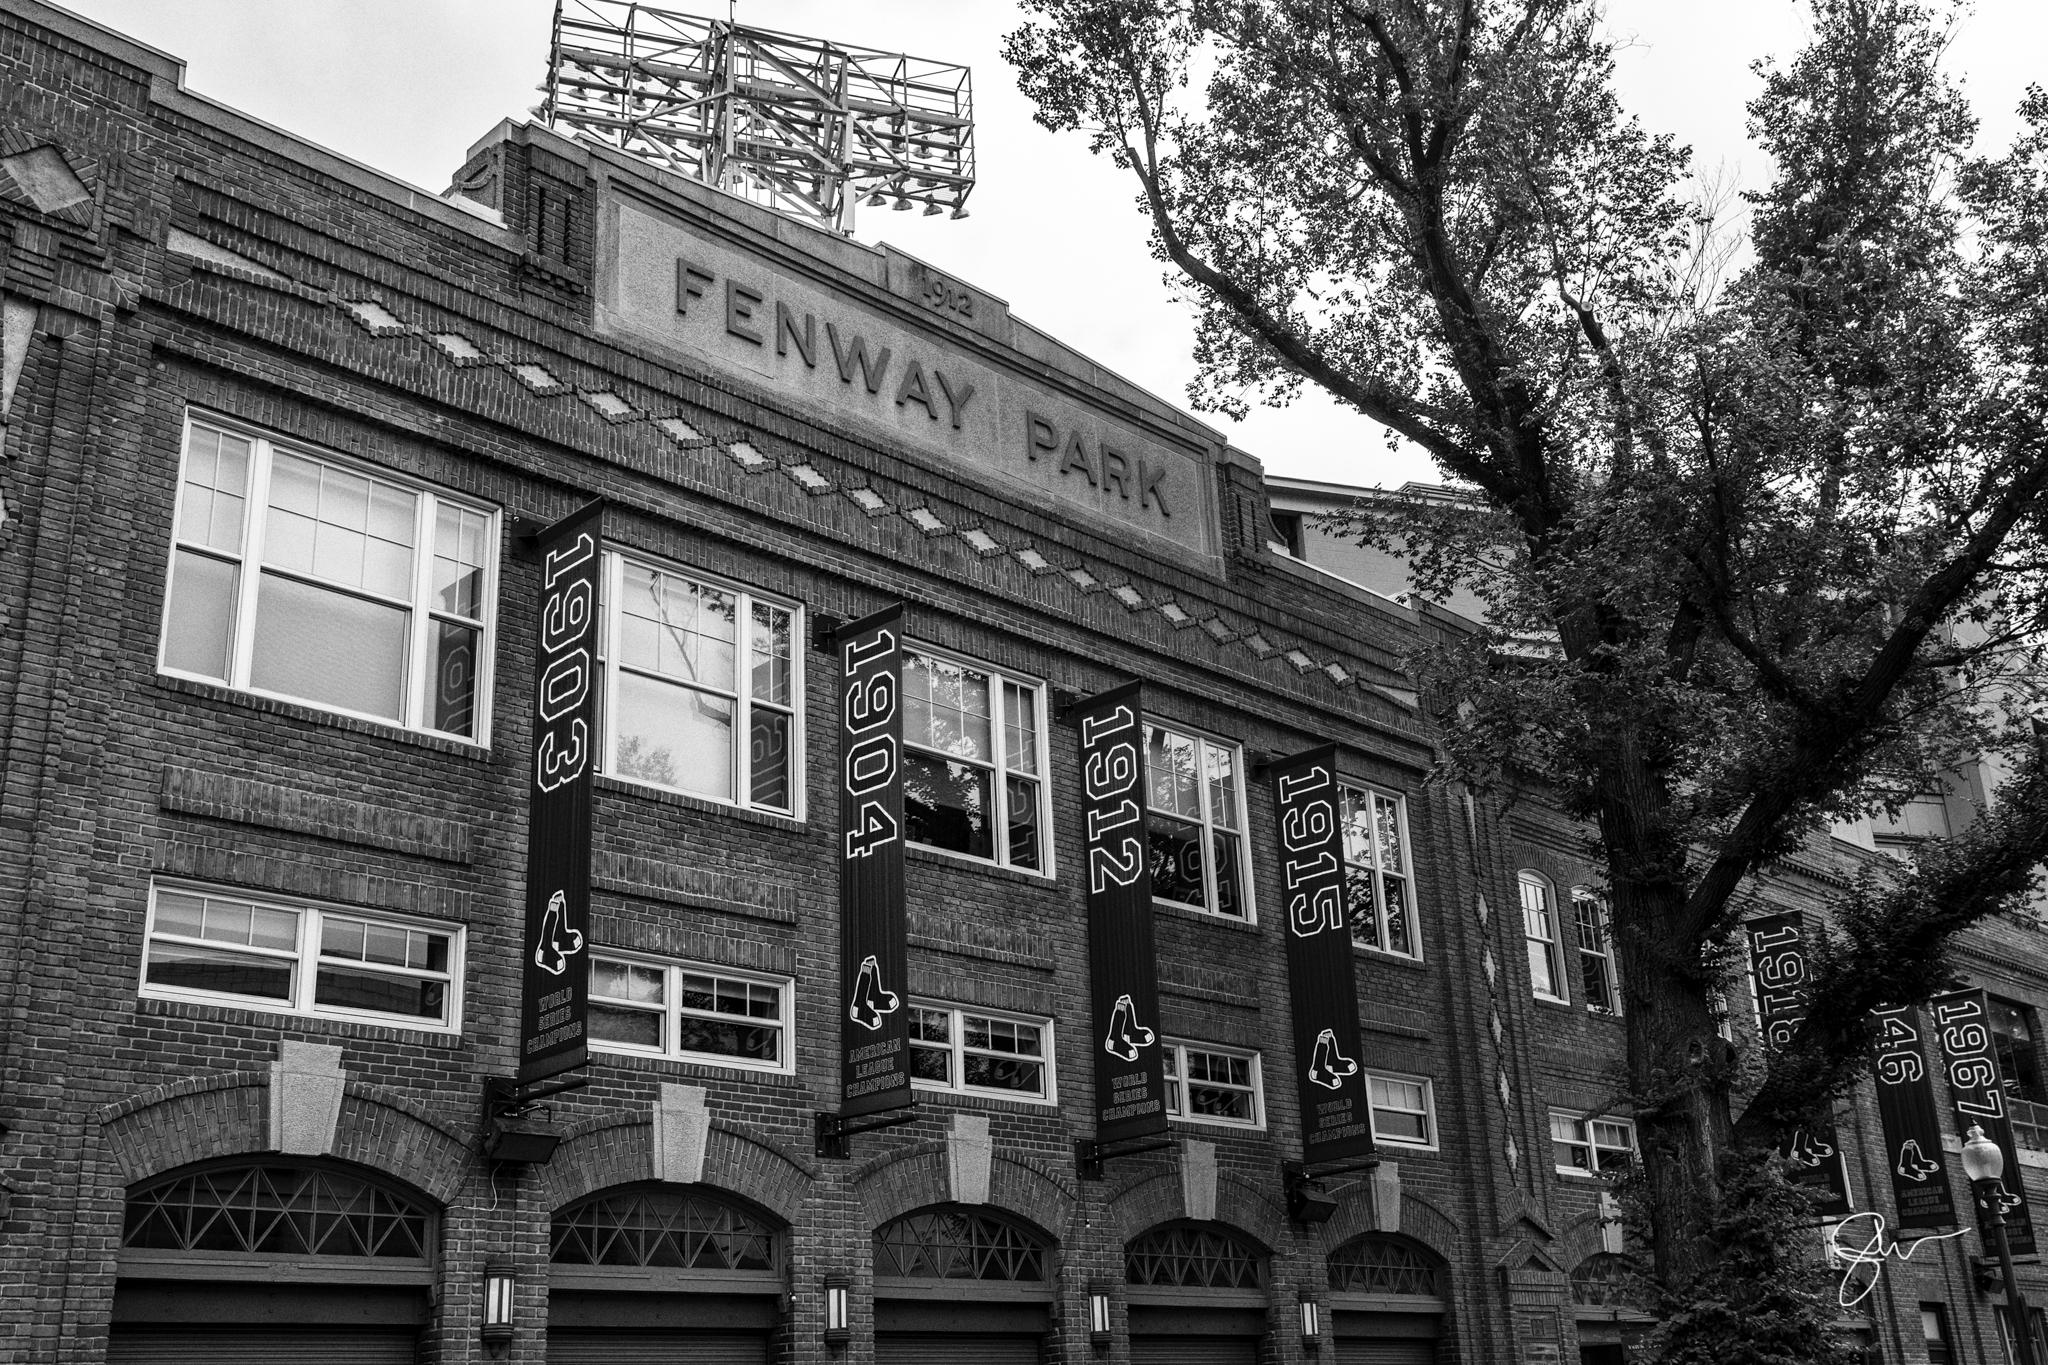 Fenway-7.jpg